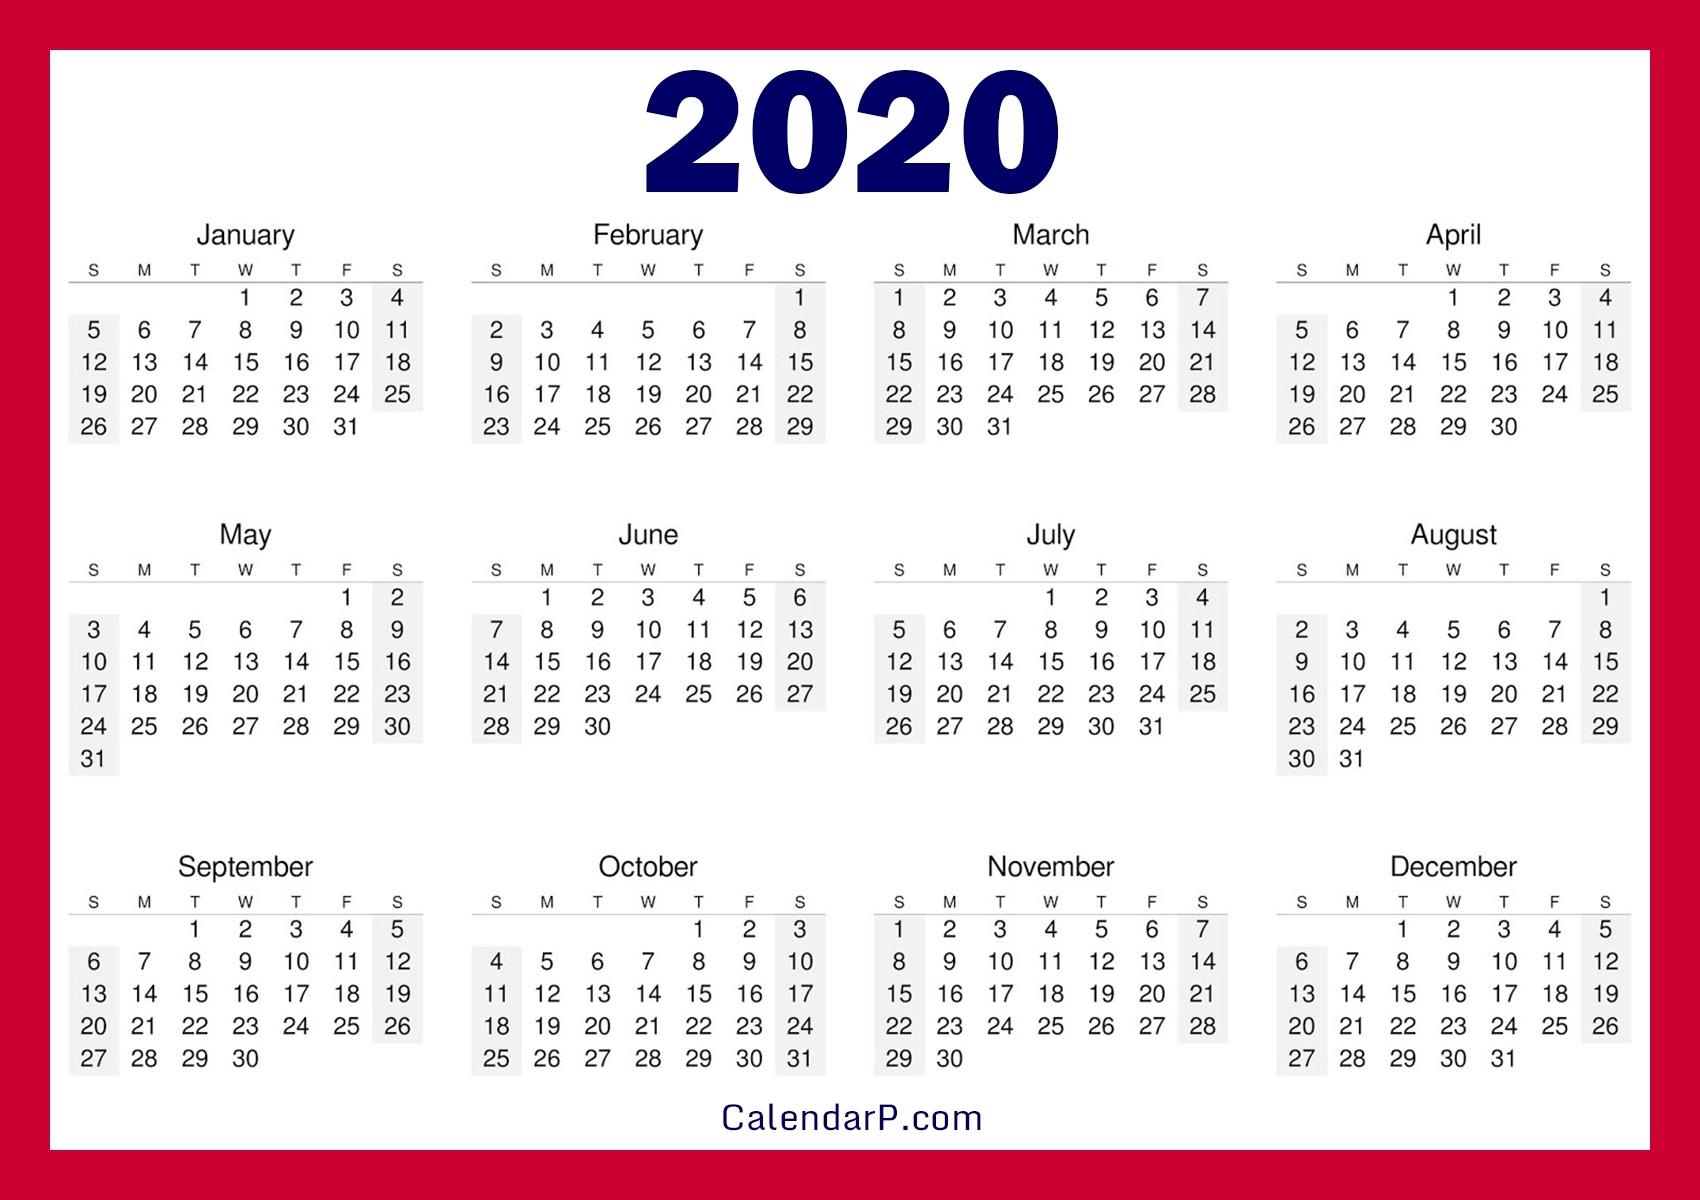 Printable Free 2020 Calendar, Horizontal, Red – Calendarp